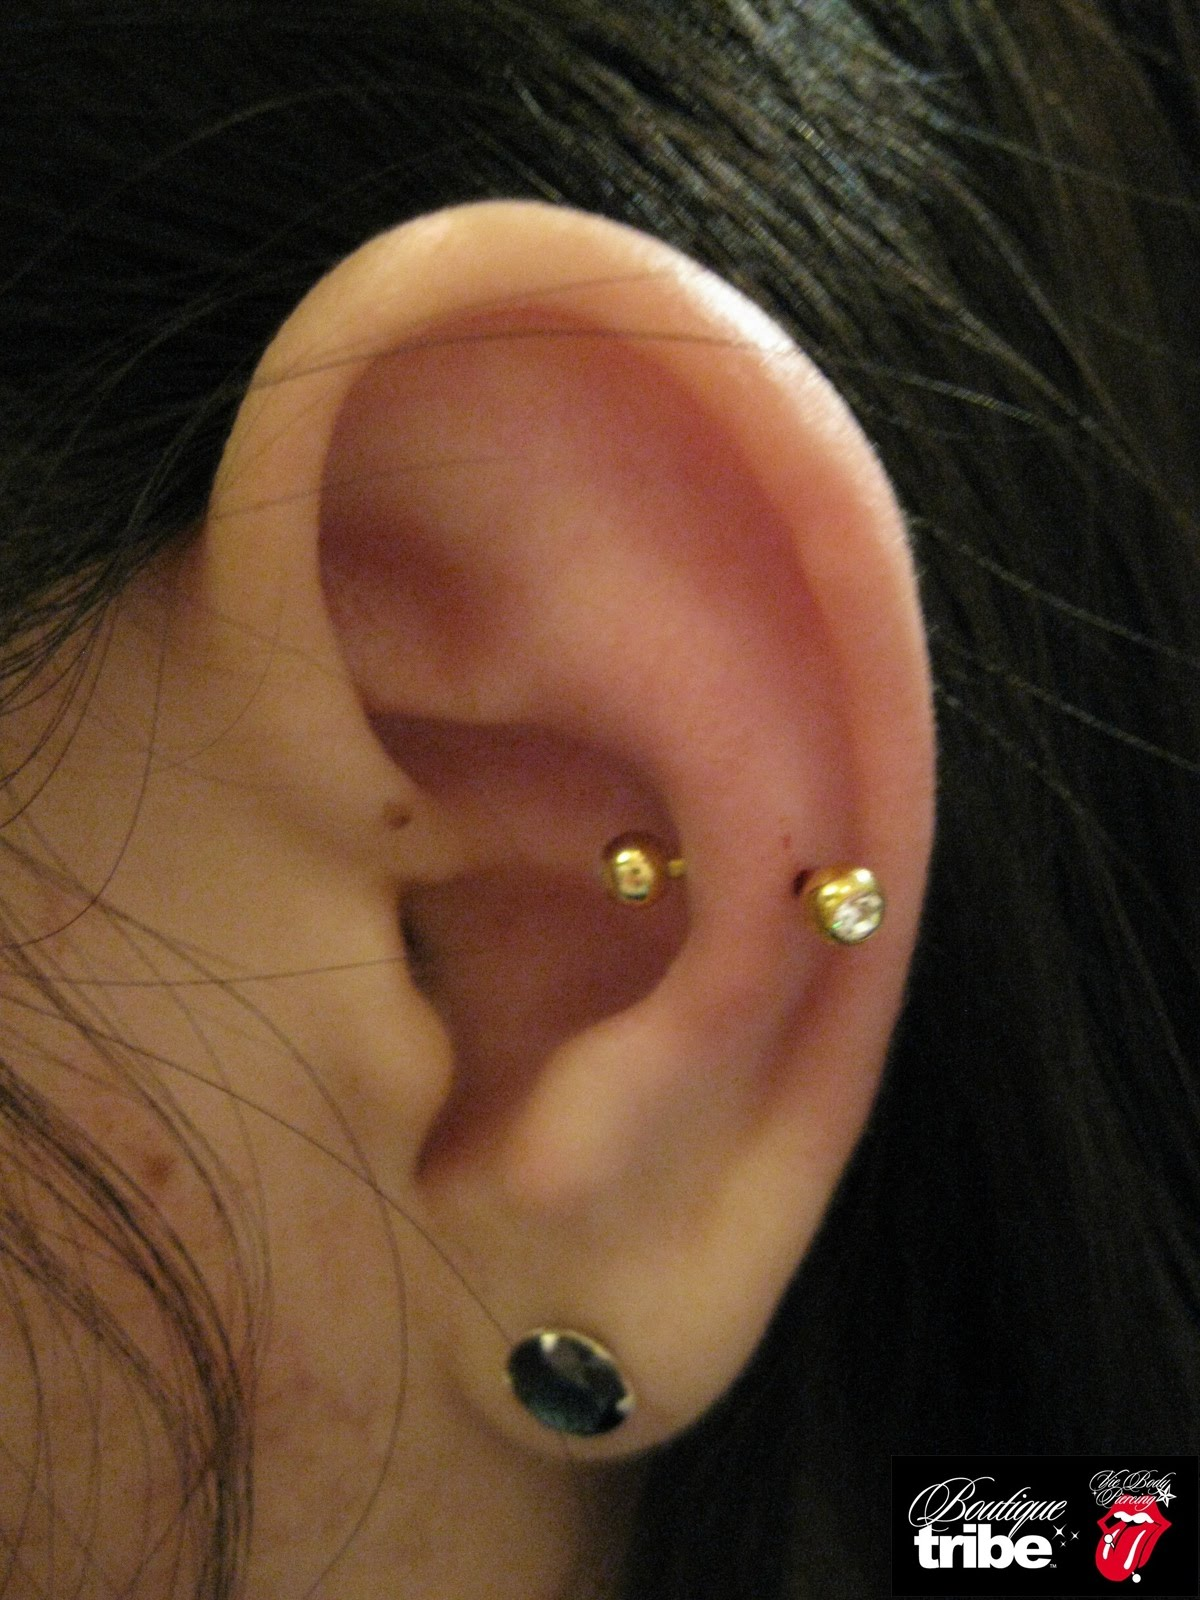 42+ Snug Piercing Pictures And Ideas Ear Piercings Snug